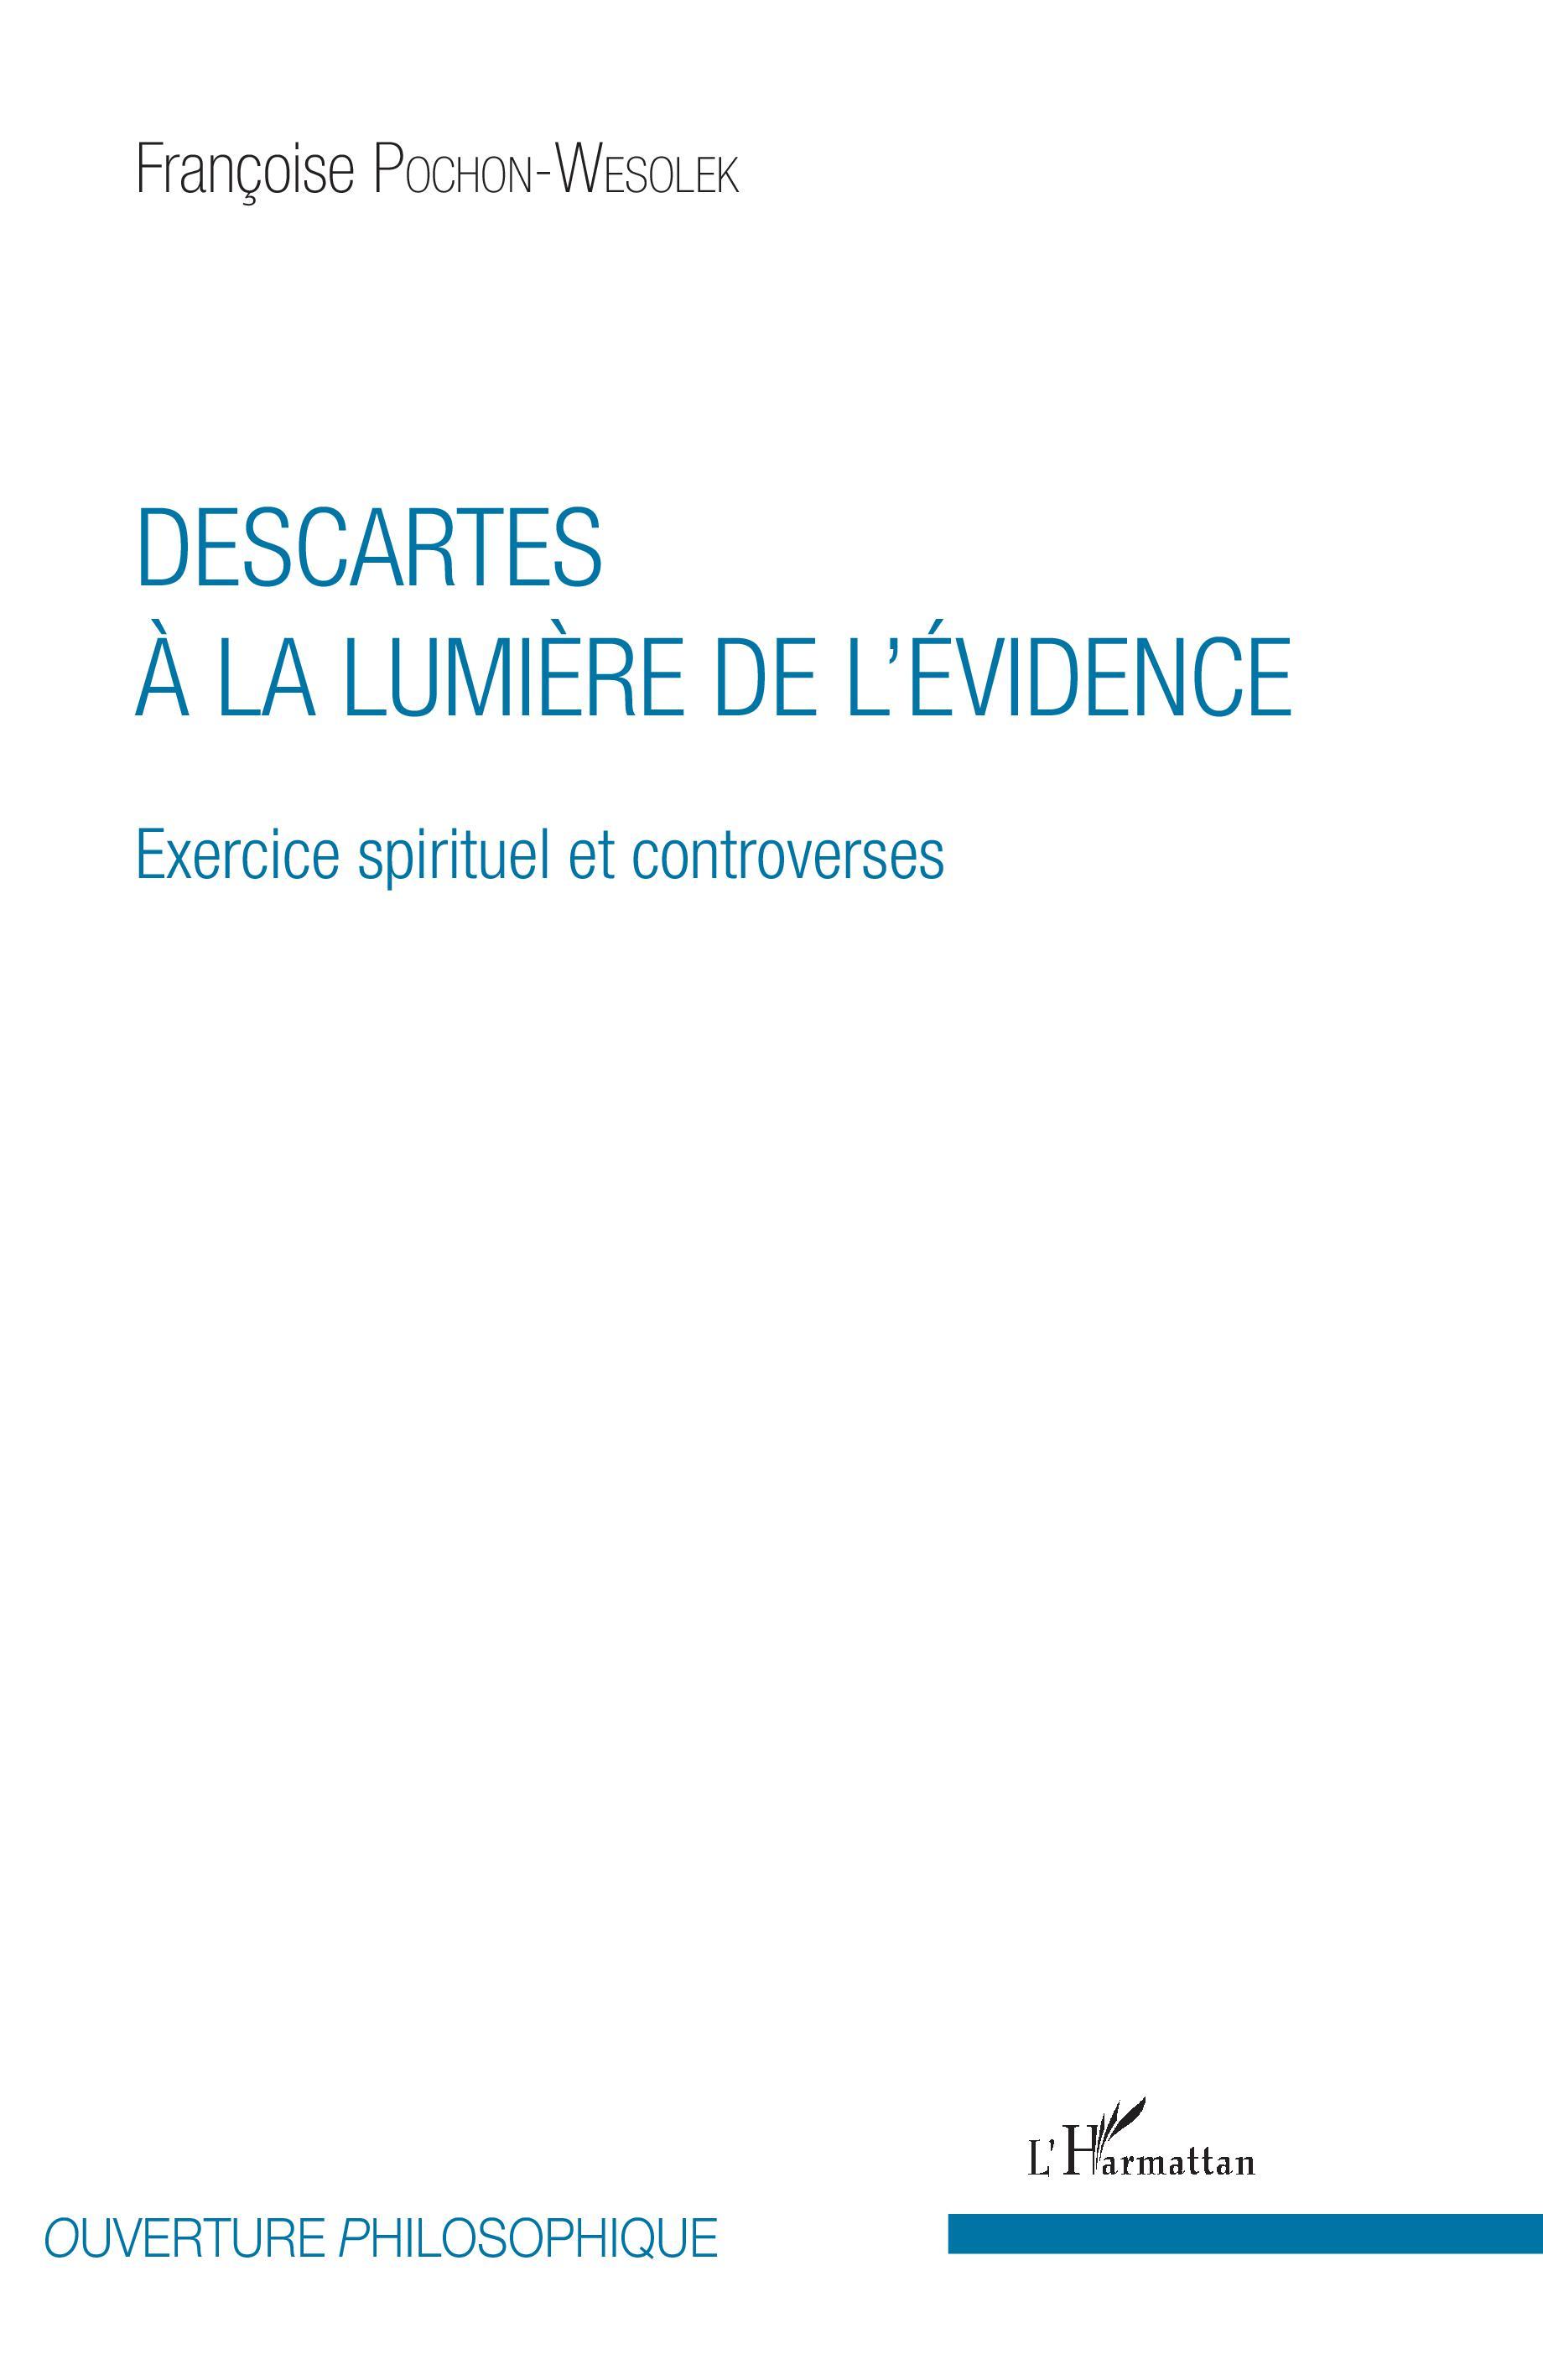 pochon_descartes_a_la_lumiere_de_l_evidence.jpg